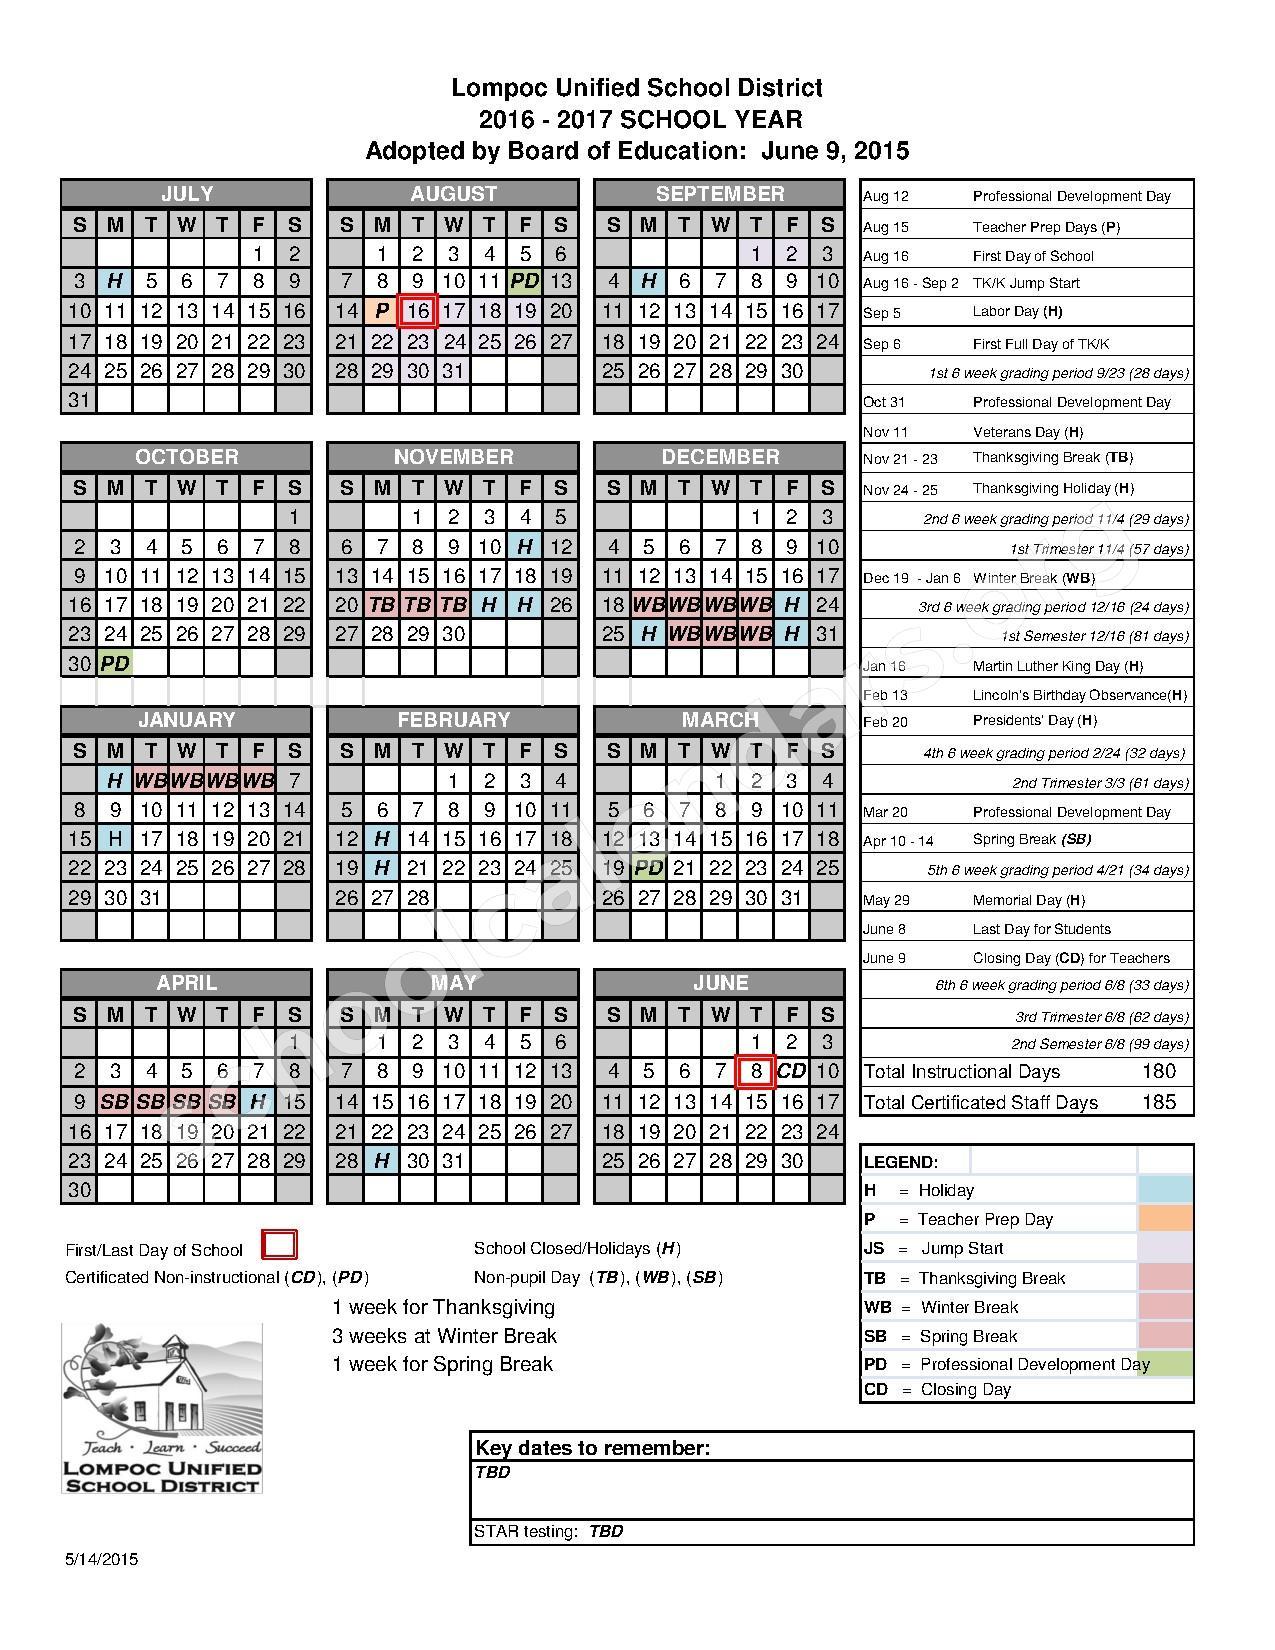 2016 - 2017 District Calendar – Lompoc Unified School District – page 1